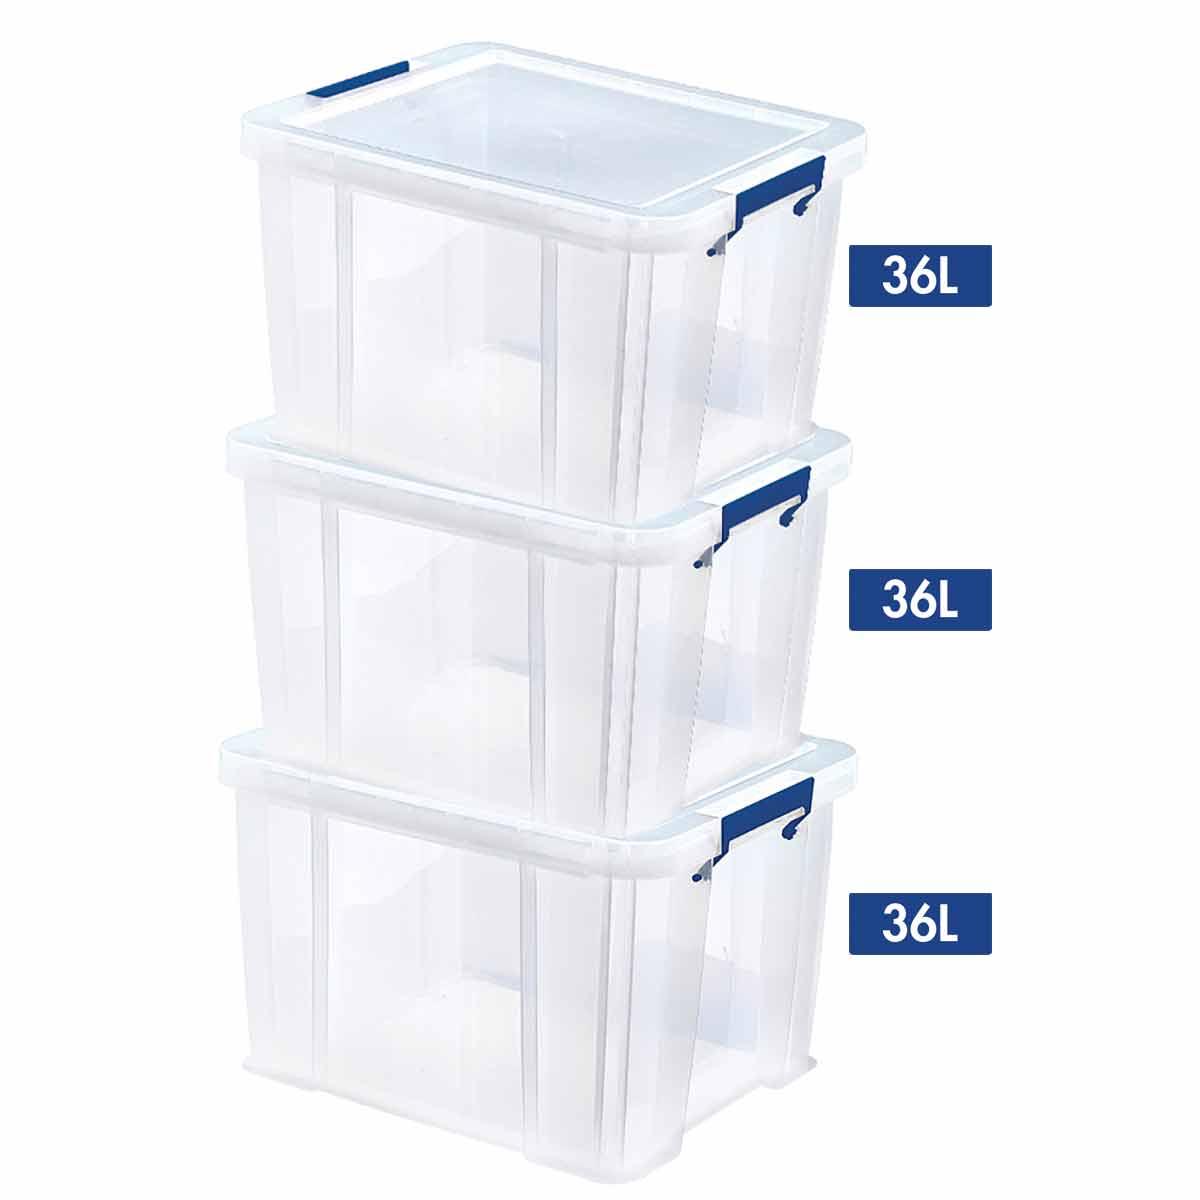 Image of ProStore Storage Box Bonus 36L pack of 3, Clear